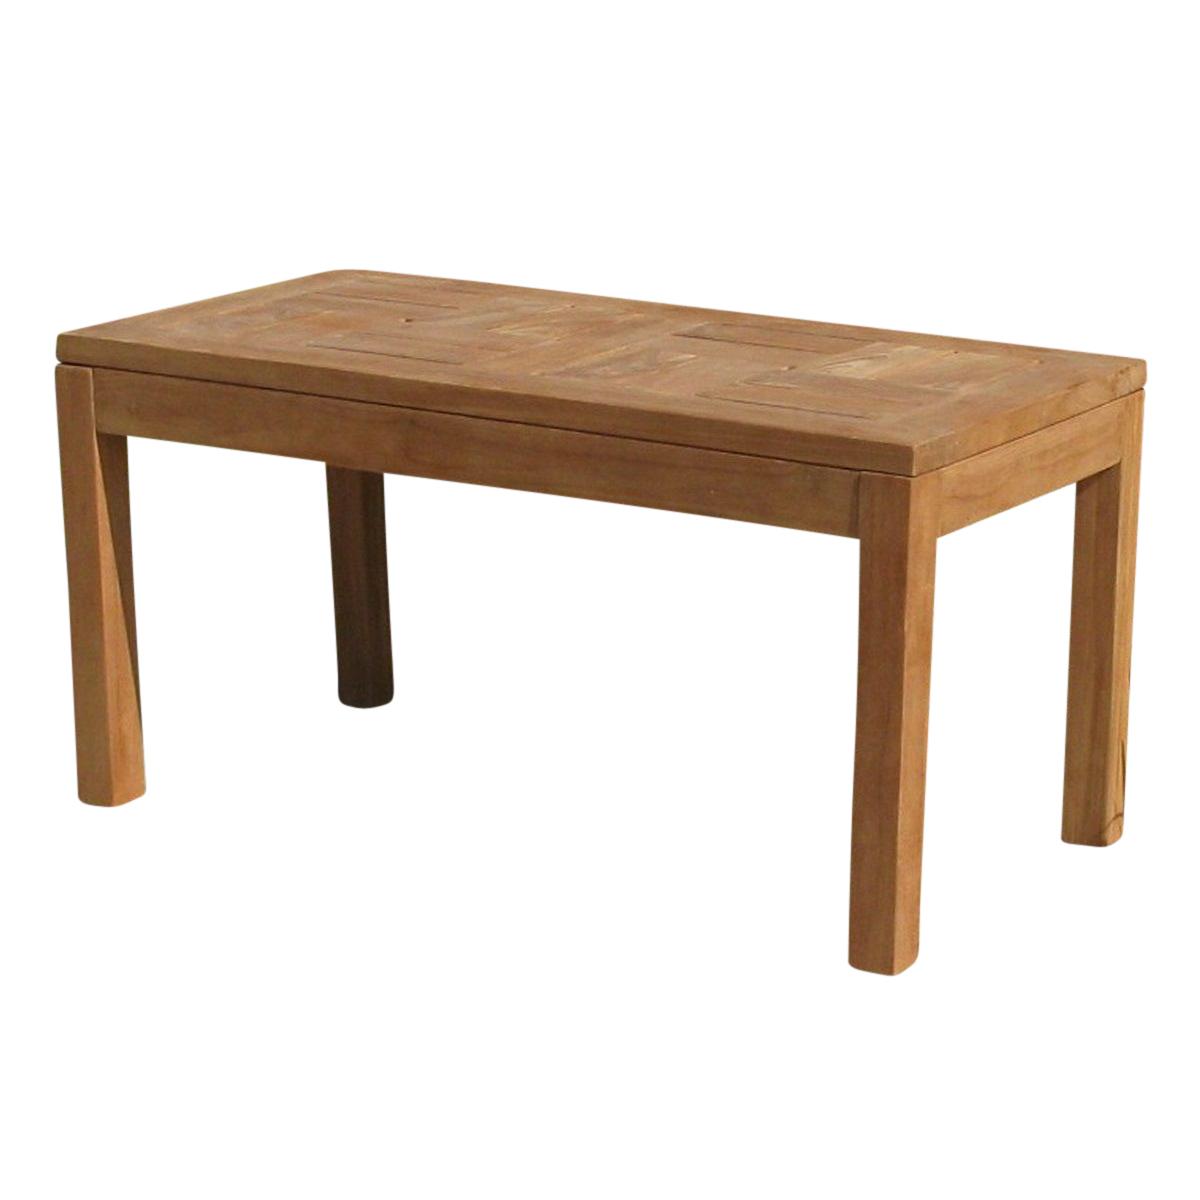 Balinese Teak Coffee Table: Bali Teak Low Rectangular Coffee Table By Eden Furniture